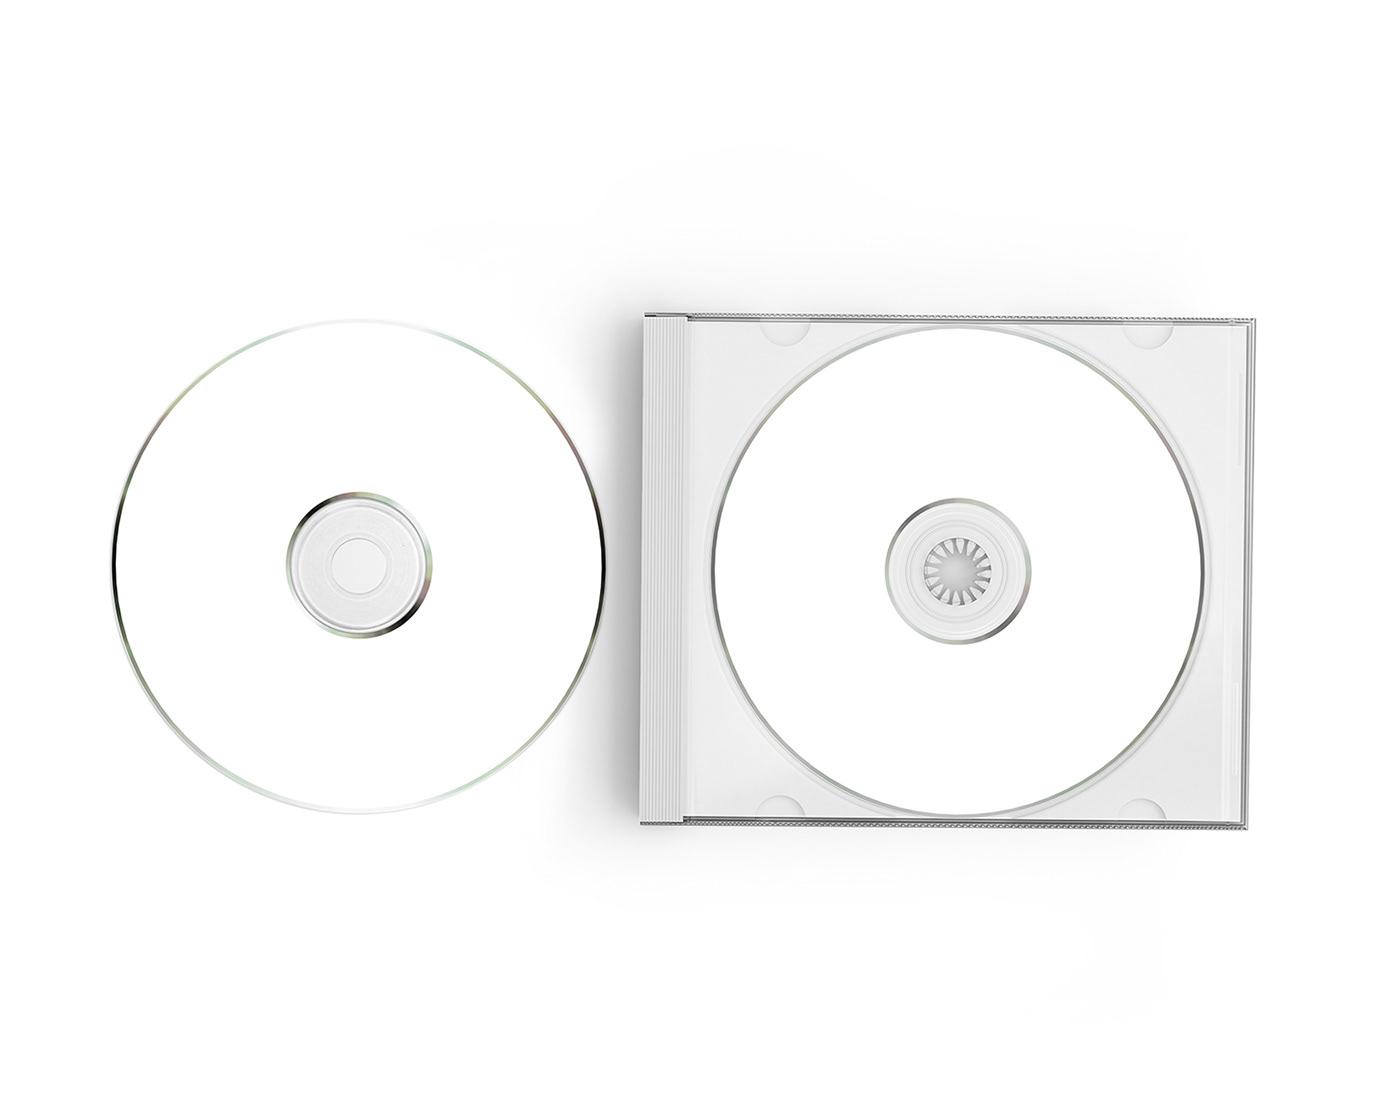 Image may contain: electronics and circle